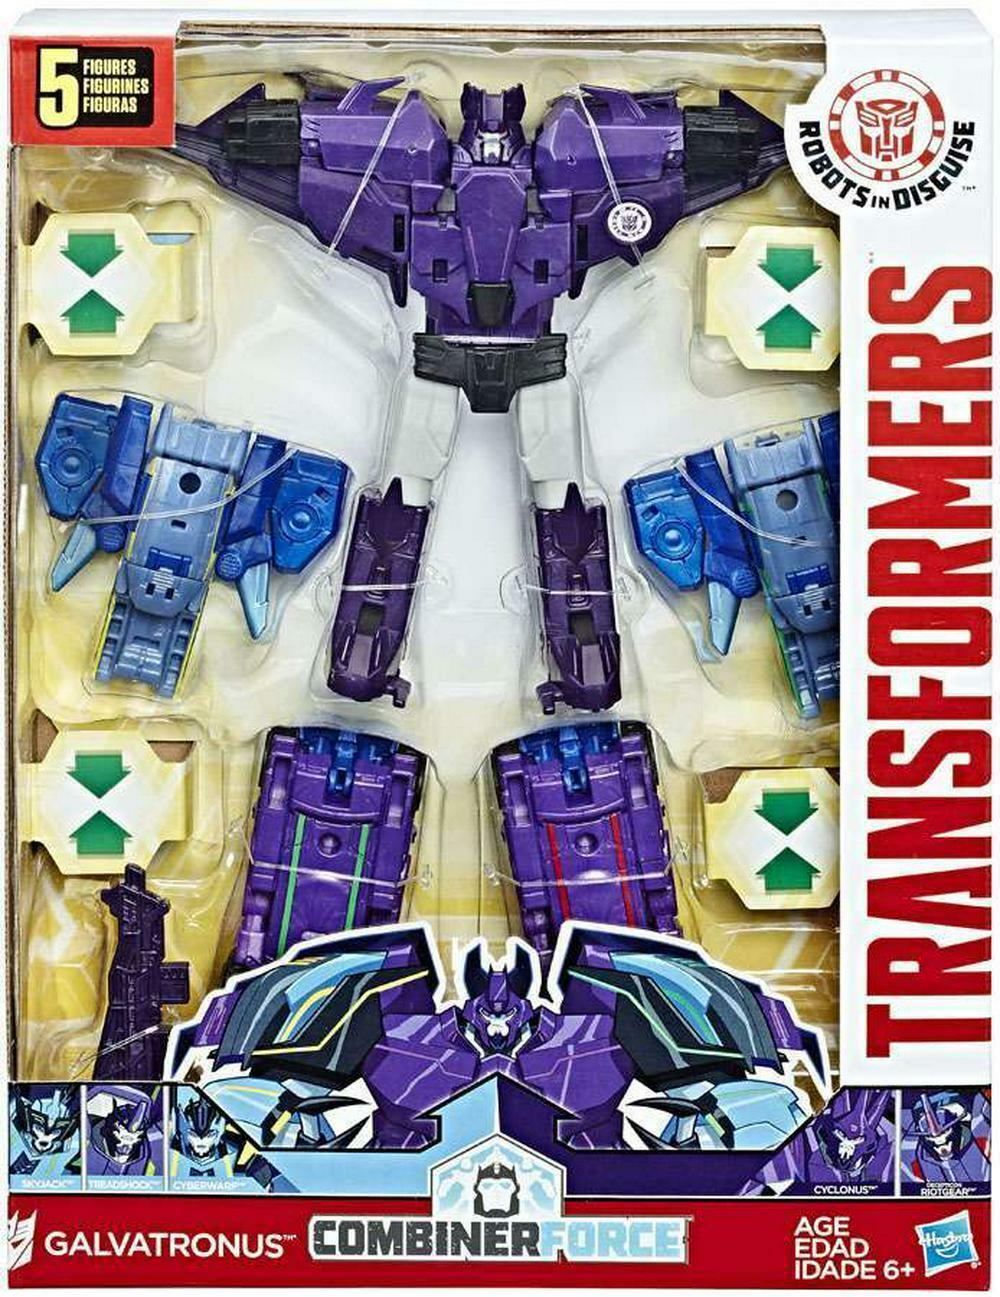 Glavatronus Robots In Disguise Transformers Action Figure Combinerforce Hasbro